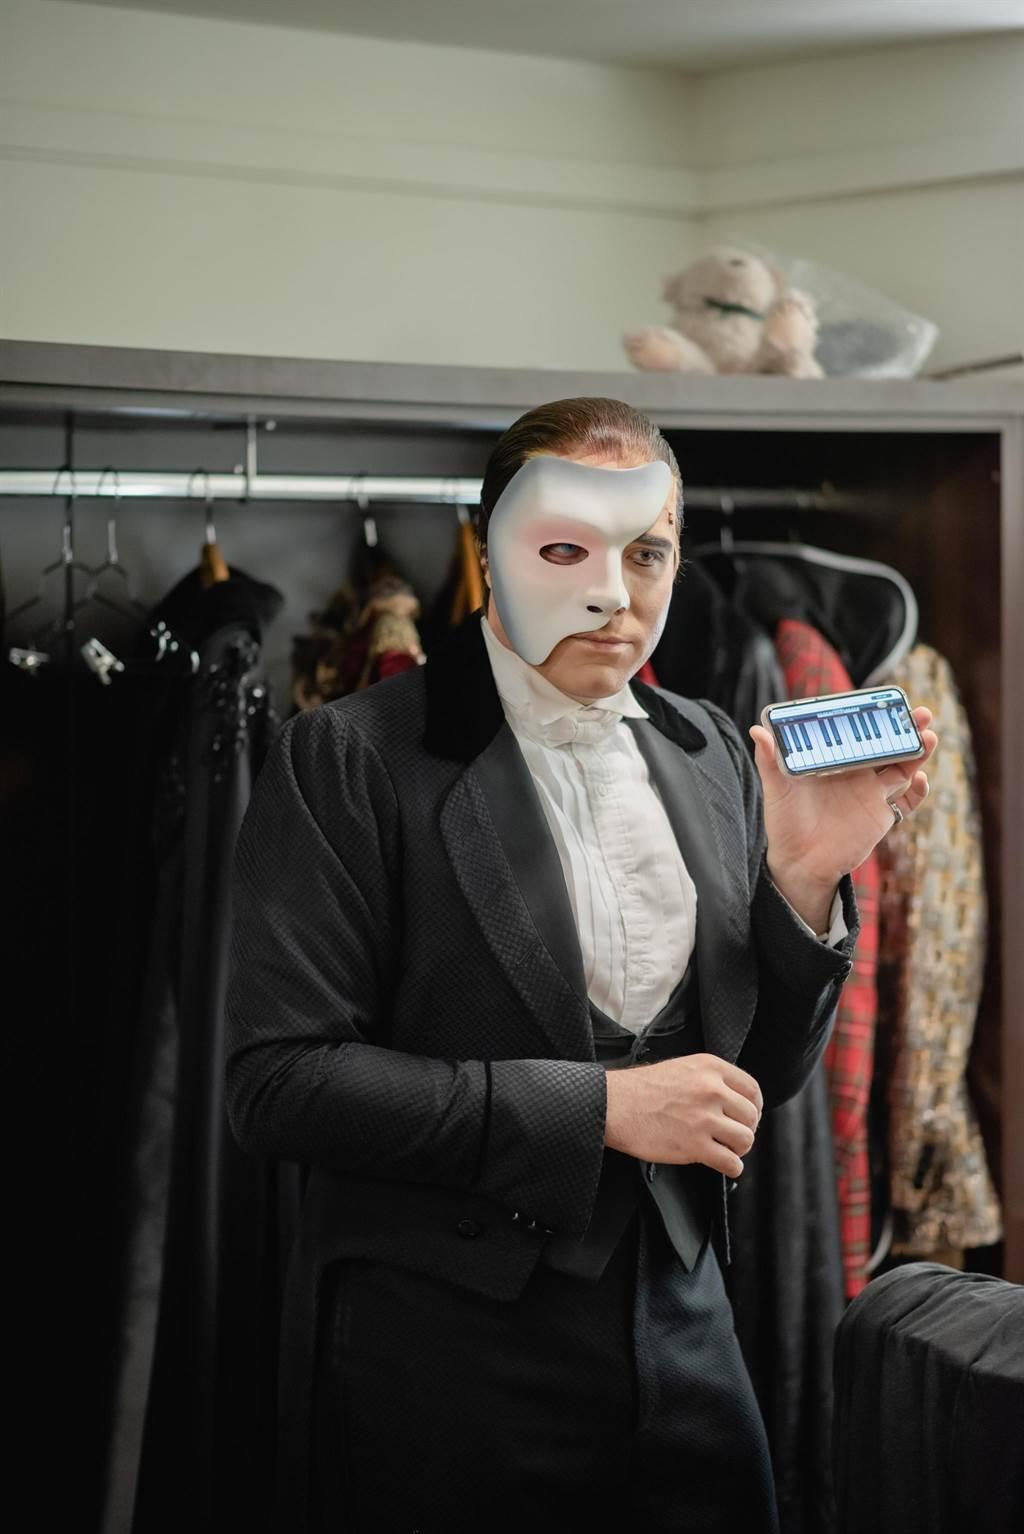 《歌劇魅影》男主角Johnathan秀出他的鋼琴APP。(寬宏藝術提供)